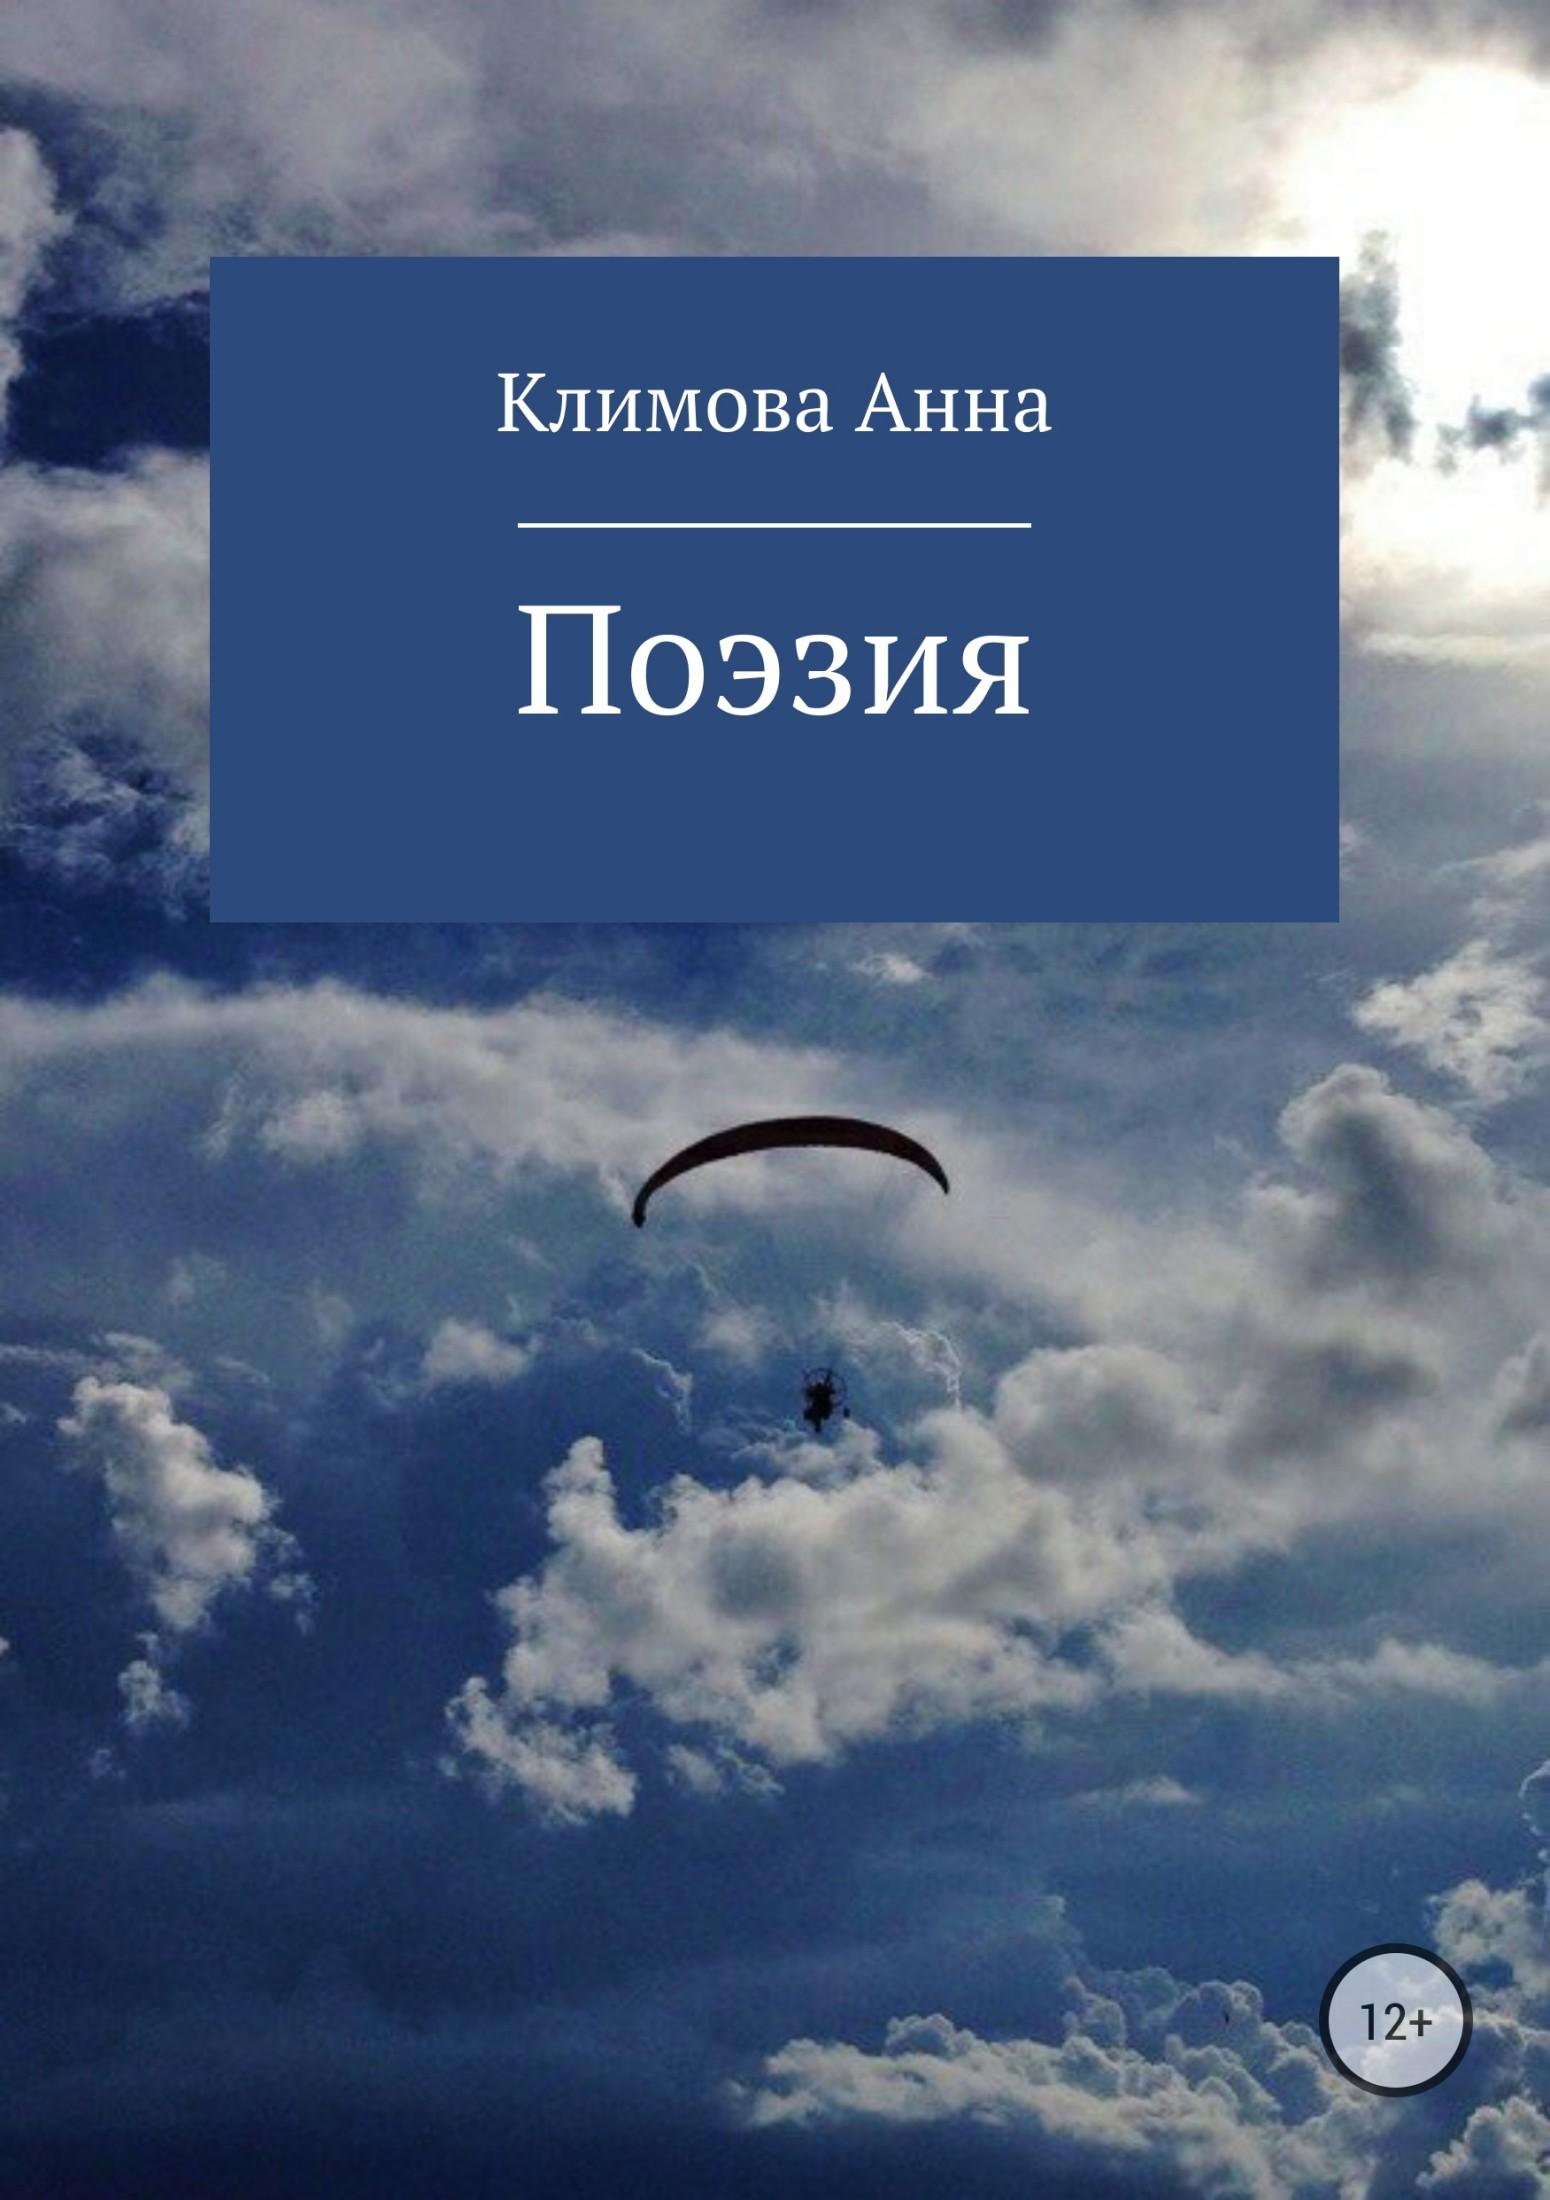 Анна Сергеевна Климова Поэзия анна сергеевна байрашная стихи о жизни